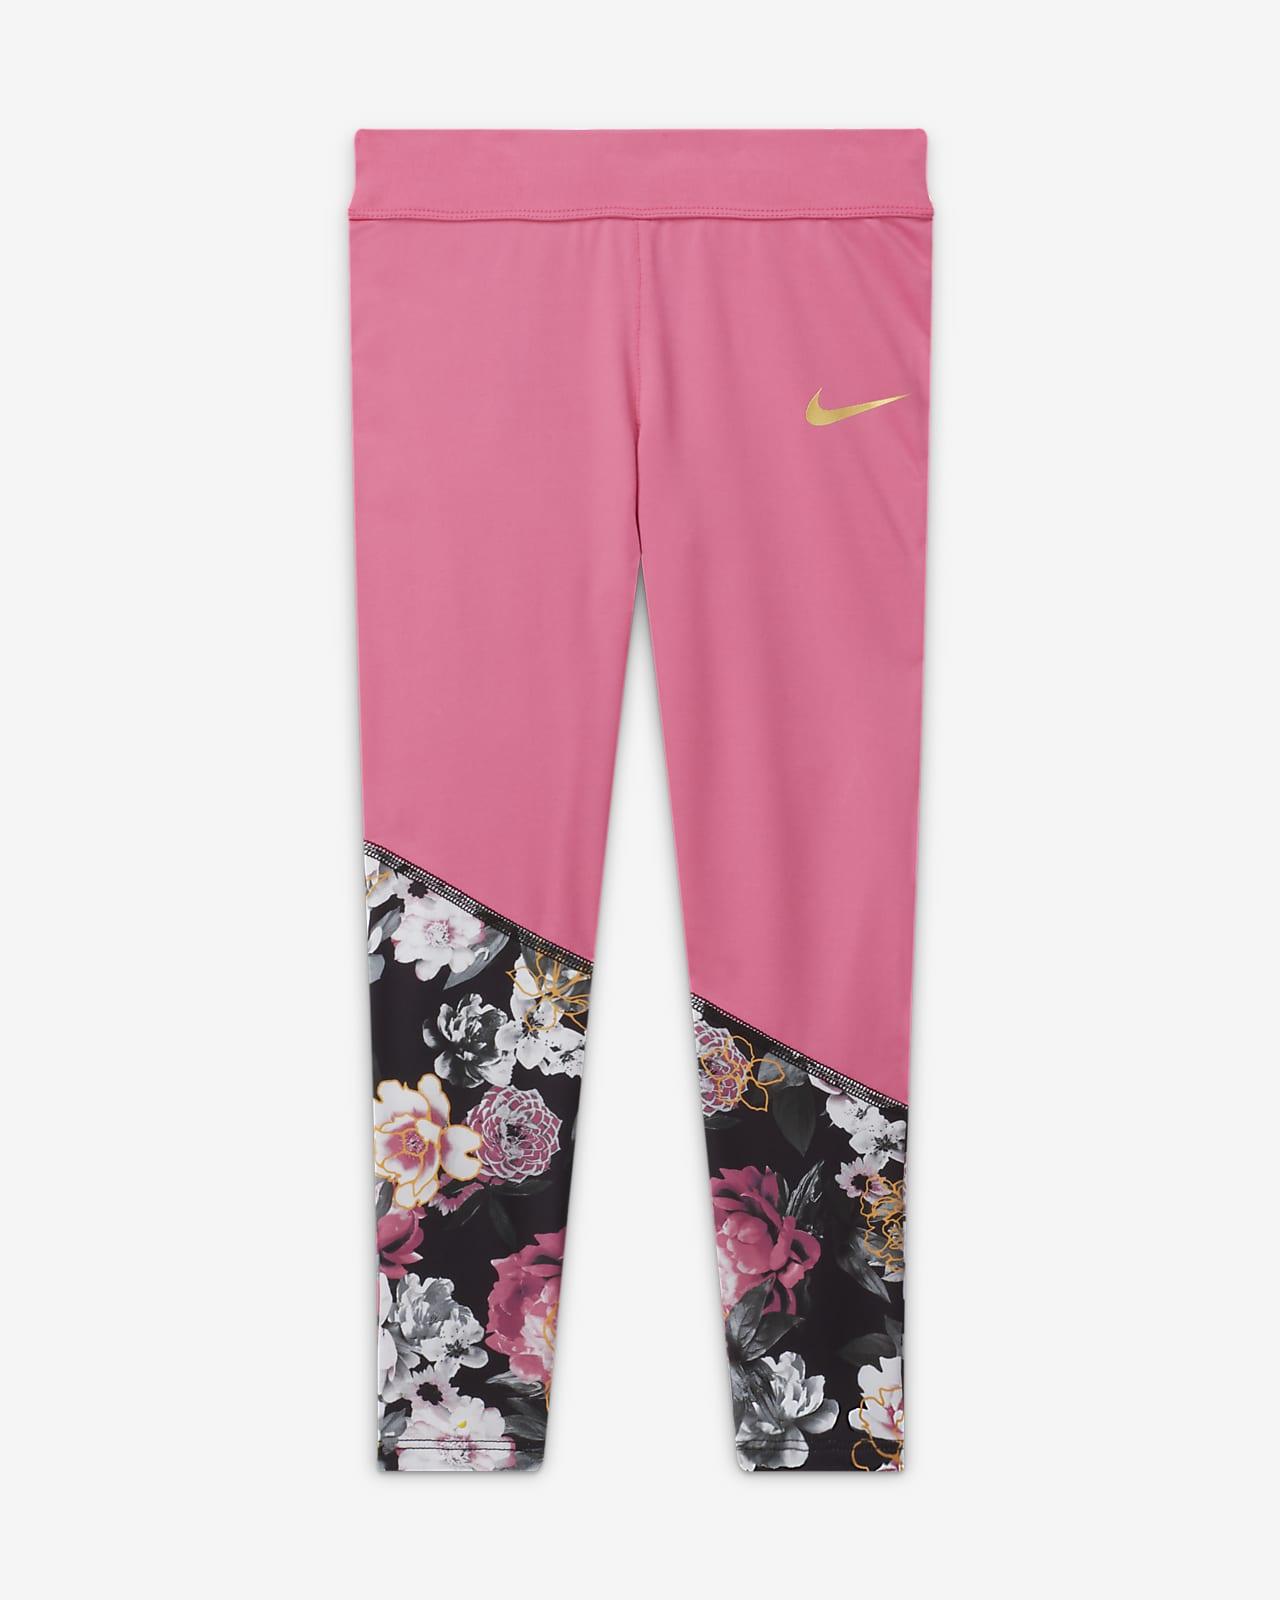 Nike Dri-FIT Little Kids' Floral Capri Leggings